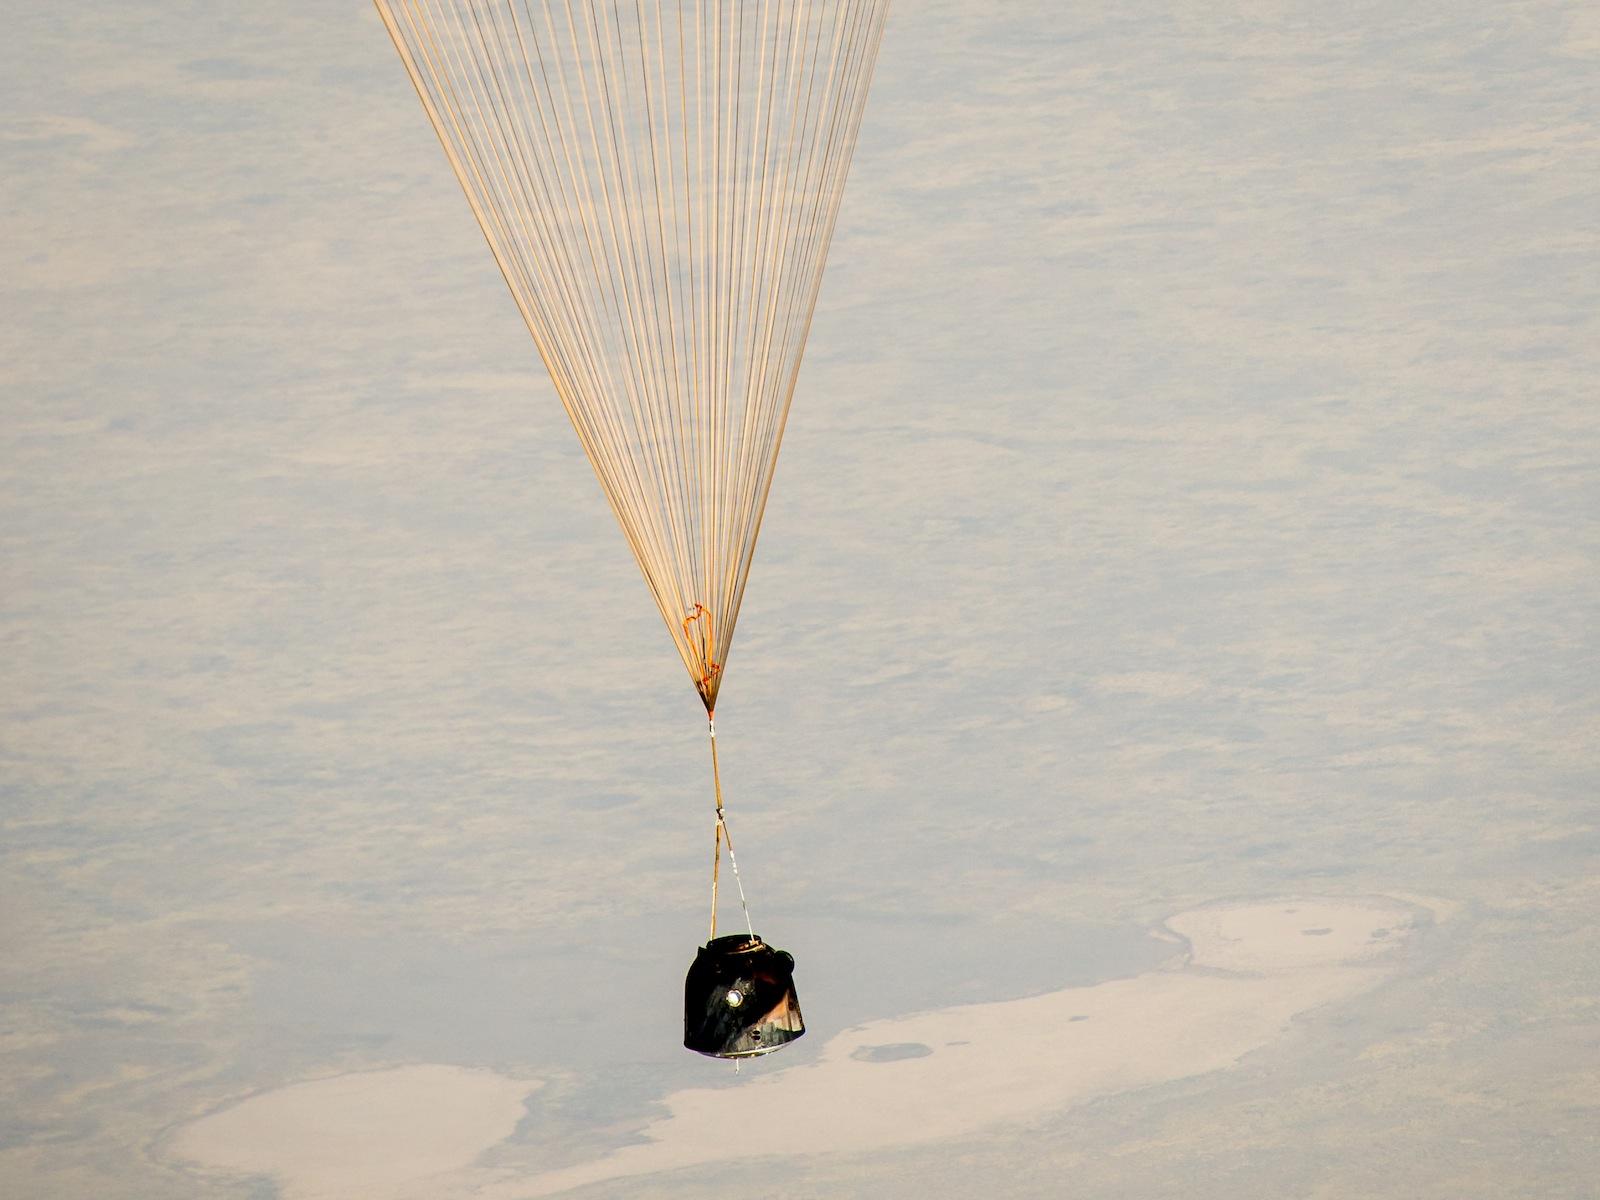 Expedition 36 Landing: Soyuz Descent